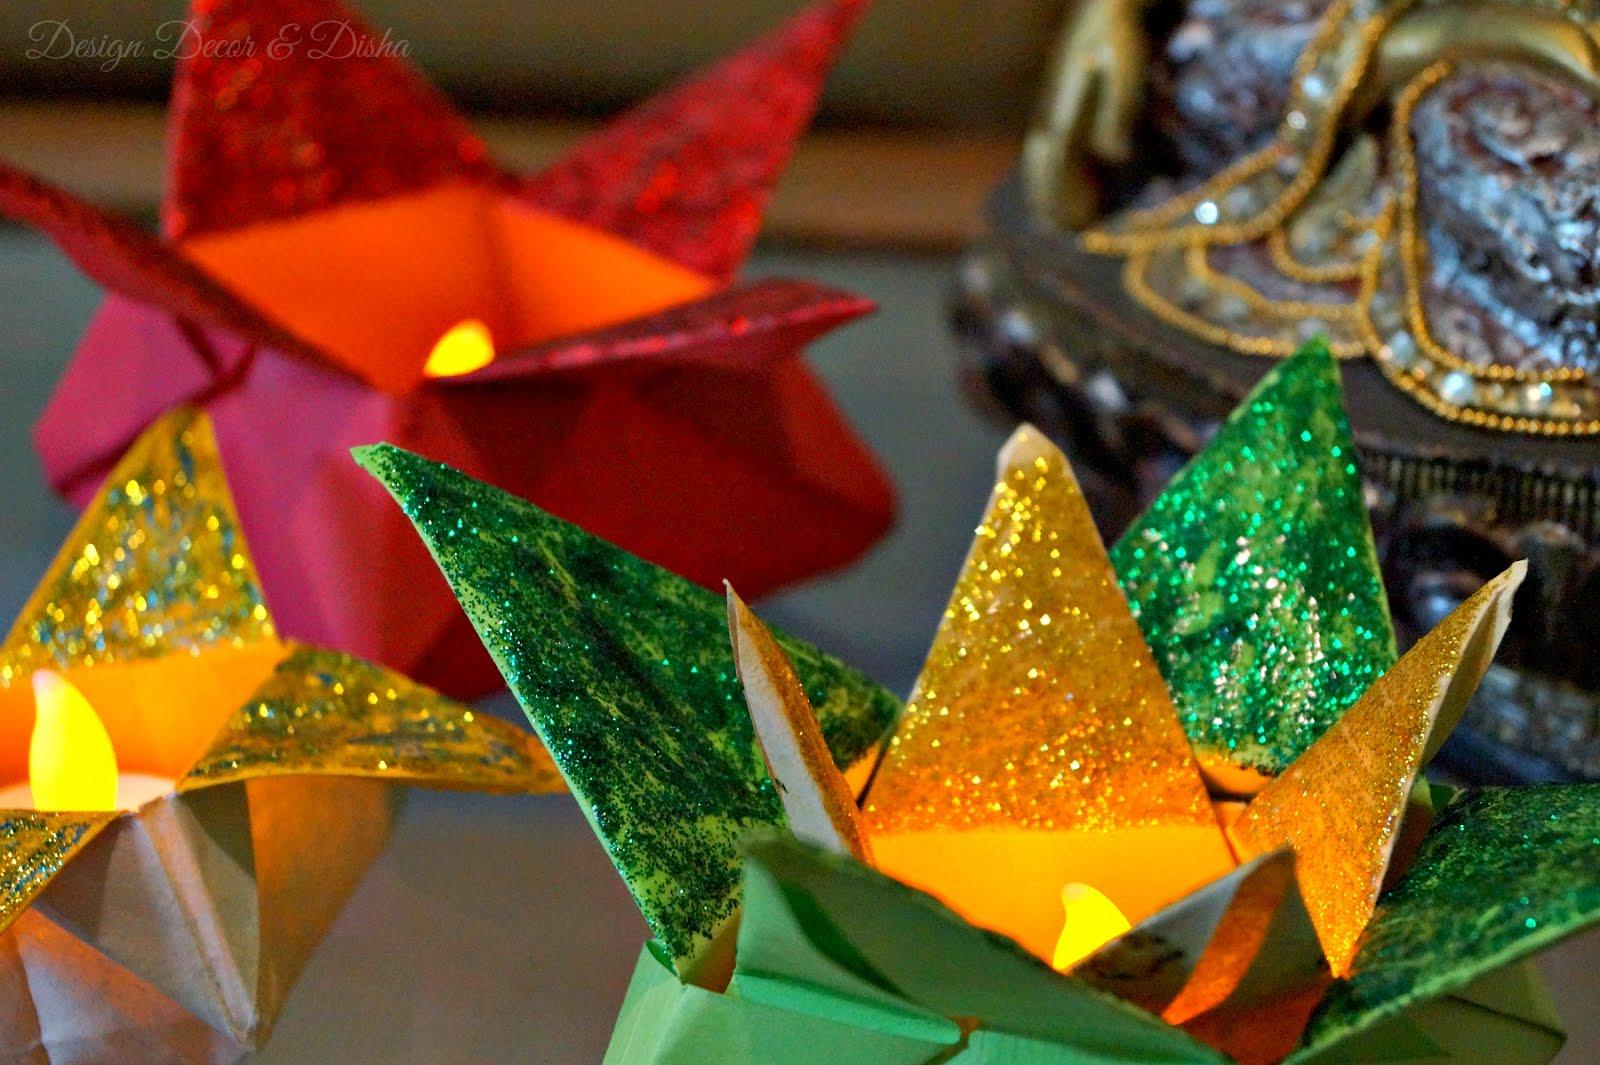 Design Decor Disha An Indian Design Decor Blog Diwali Craft